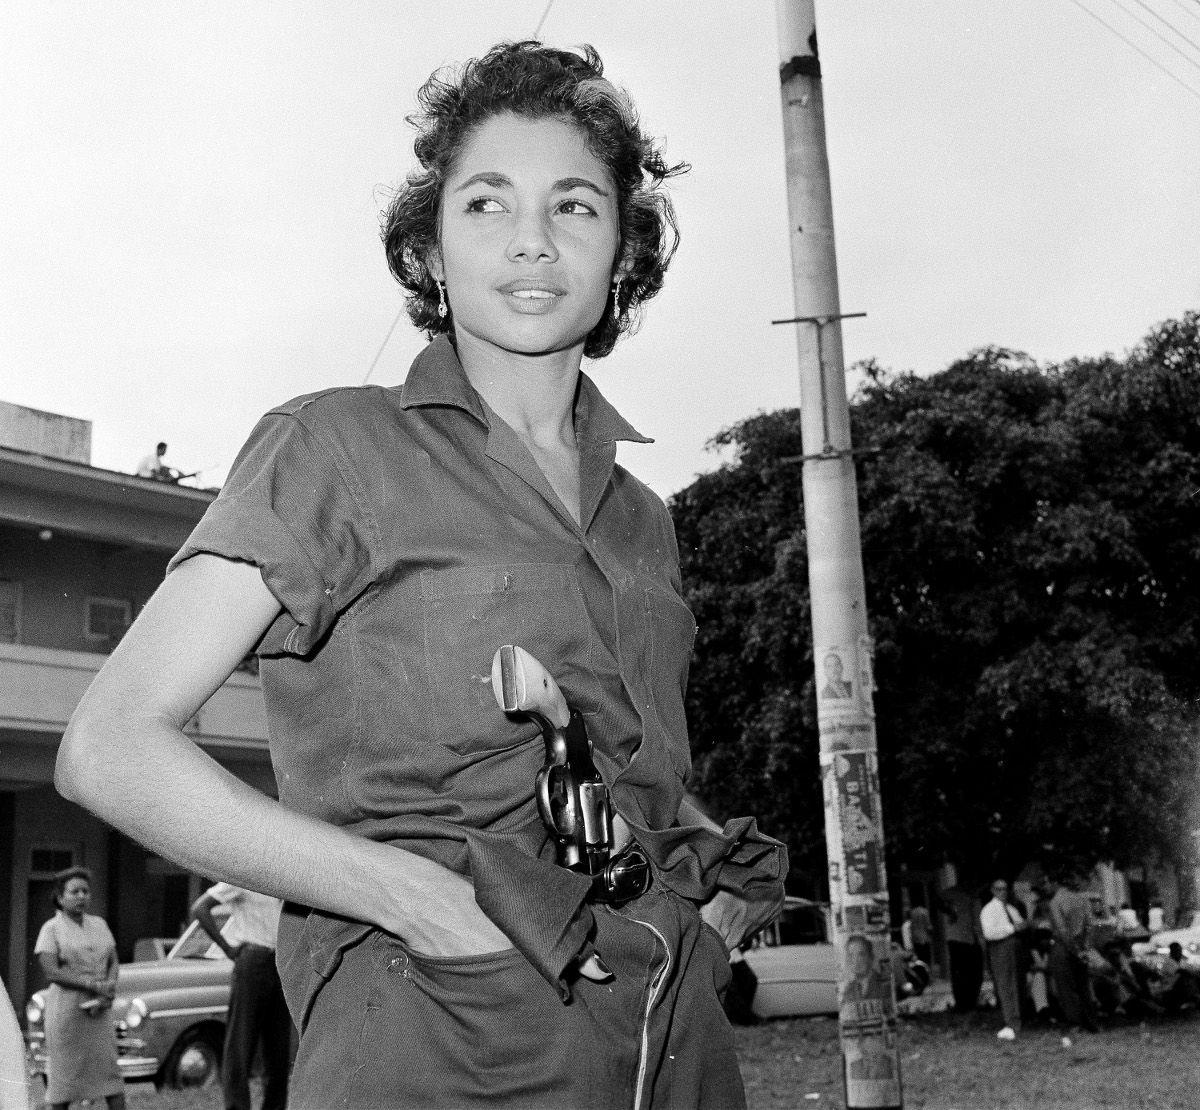 A young unidentified woman patrols near a headquarters building in Havana, Jan. 4, 1959.